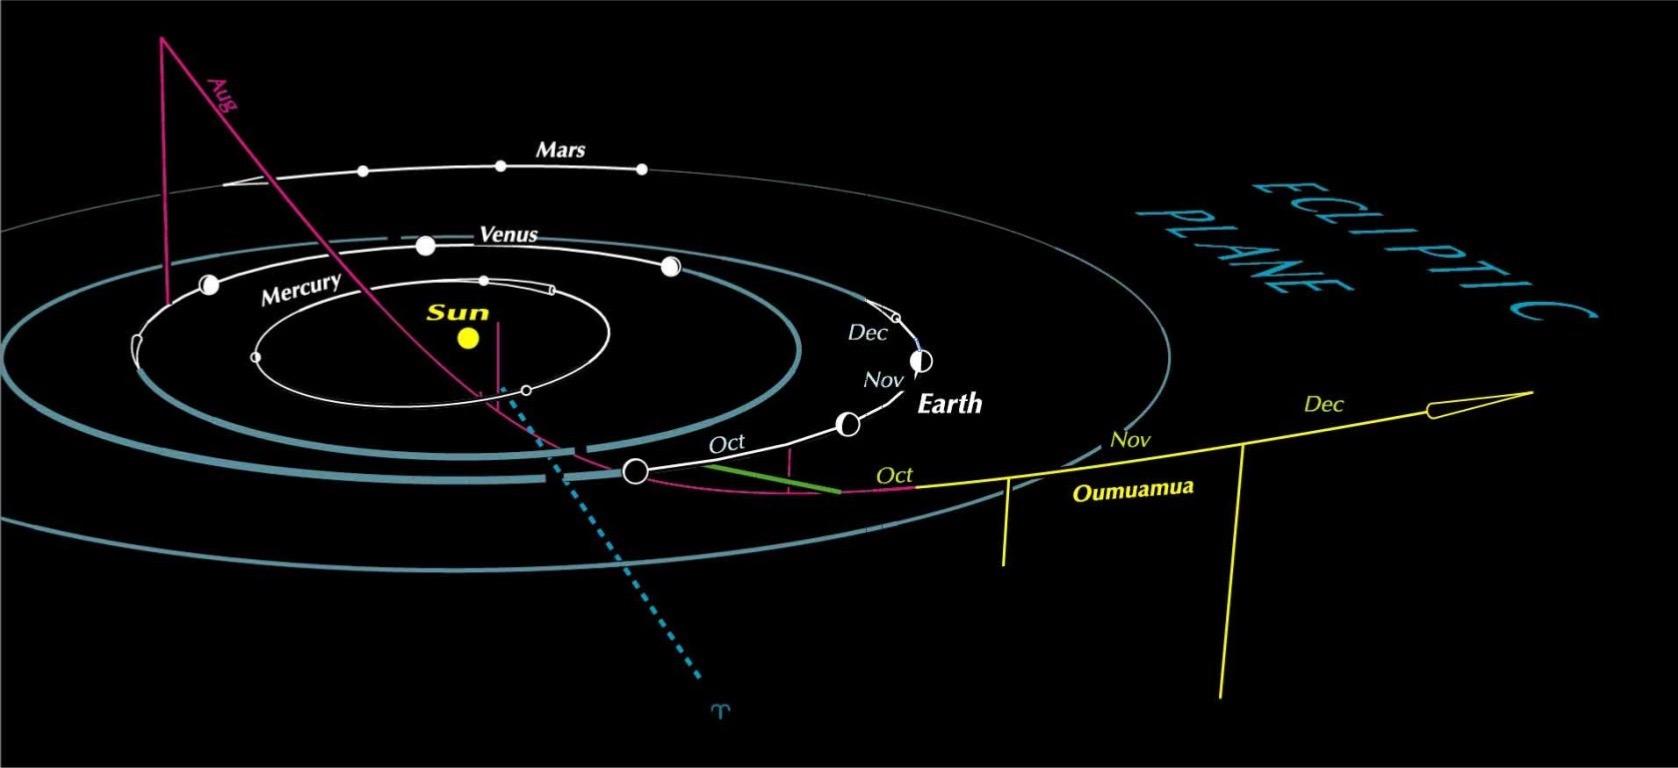 Risultati immagini per Oumuamua